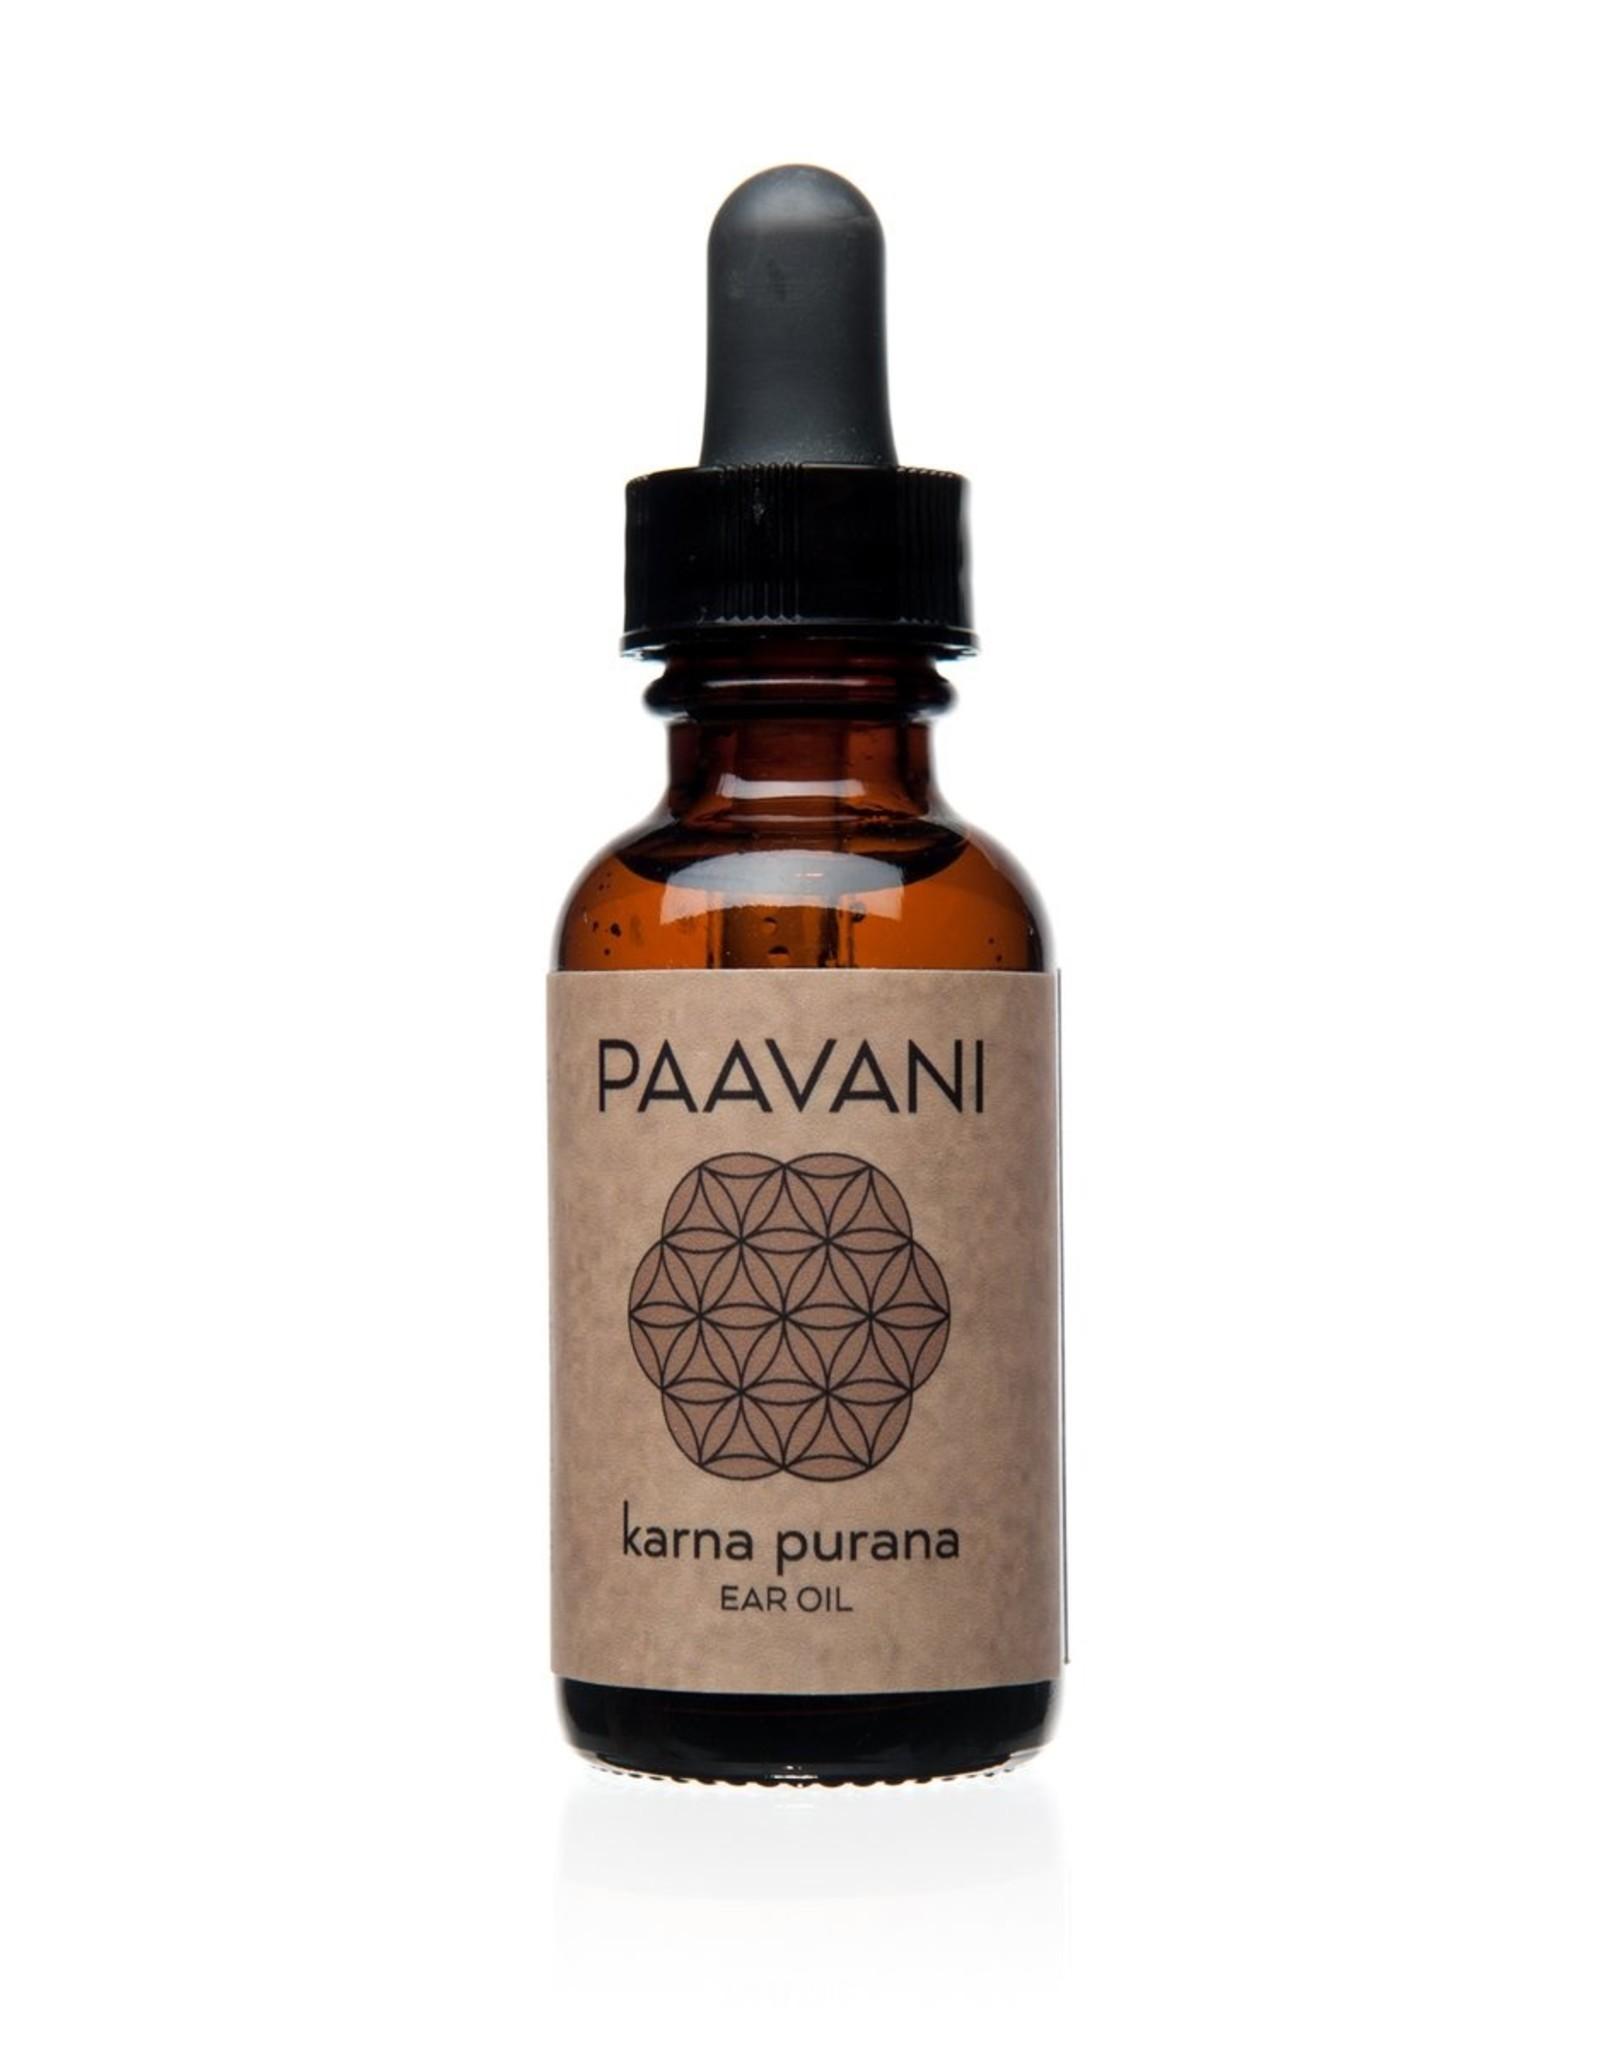 PAAVANI Ayurveda Ear Oil - Karna Purana